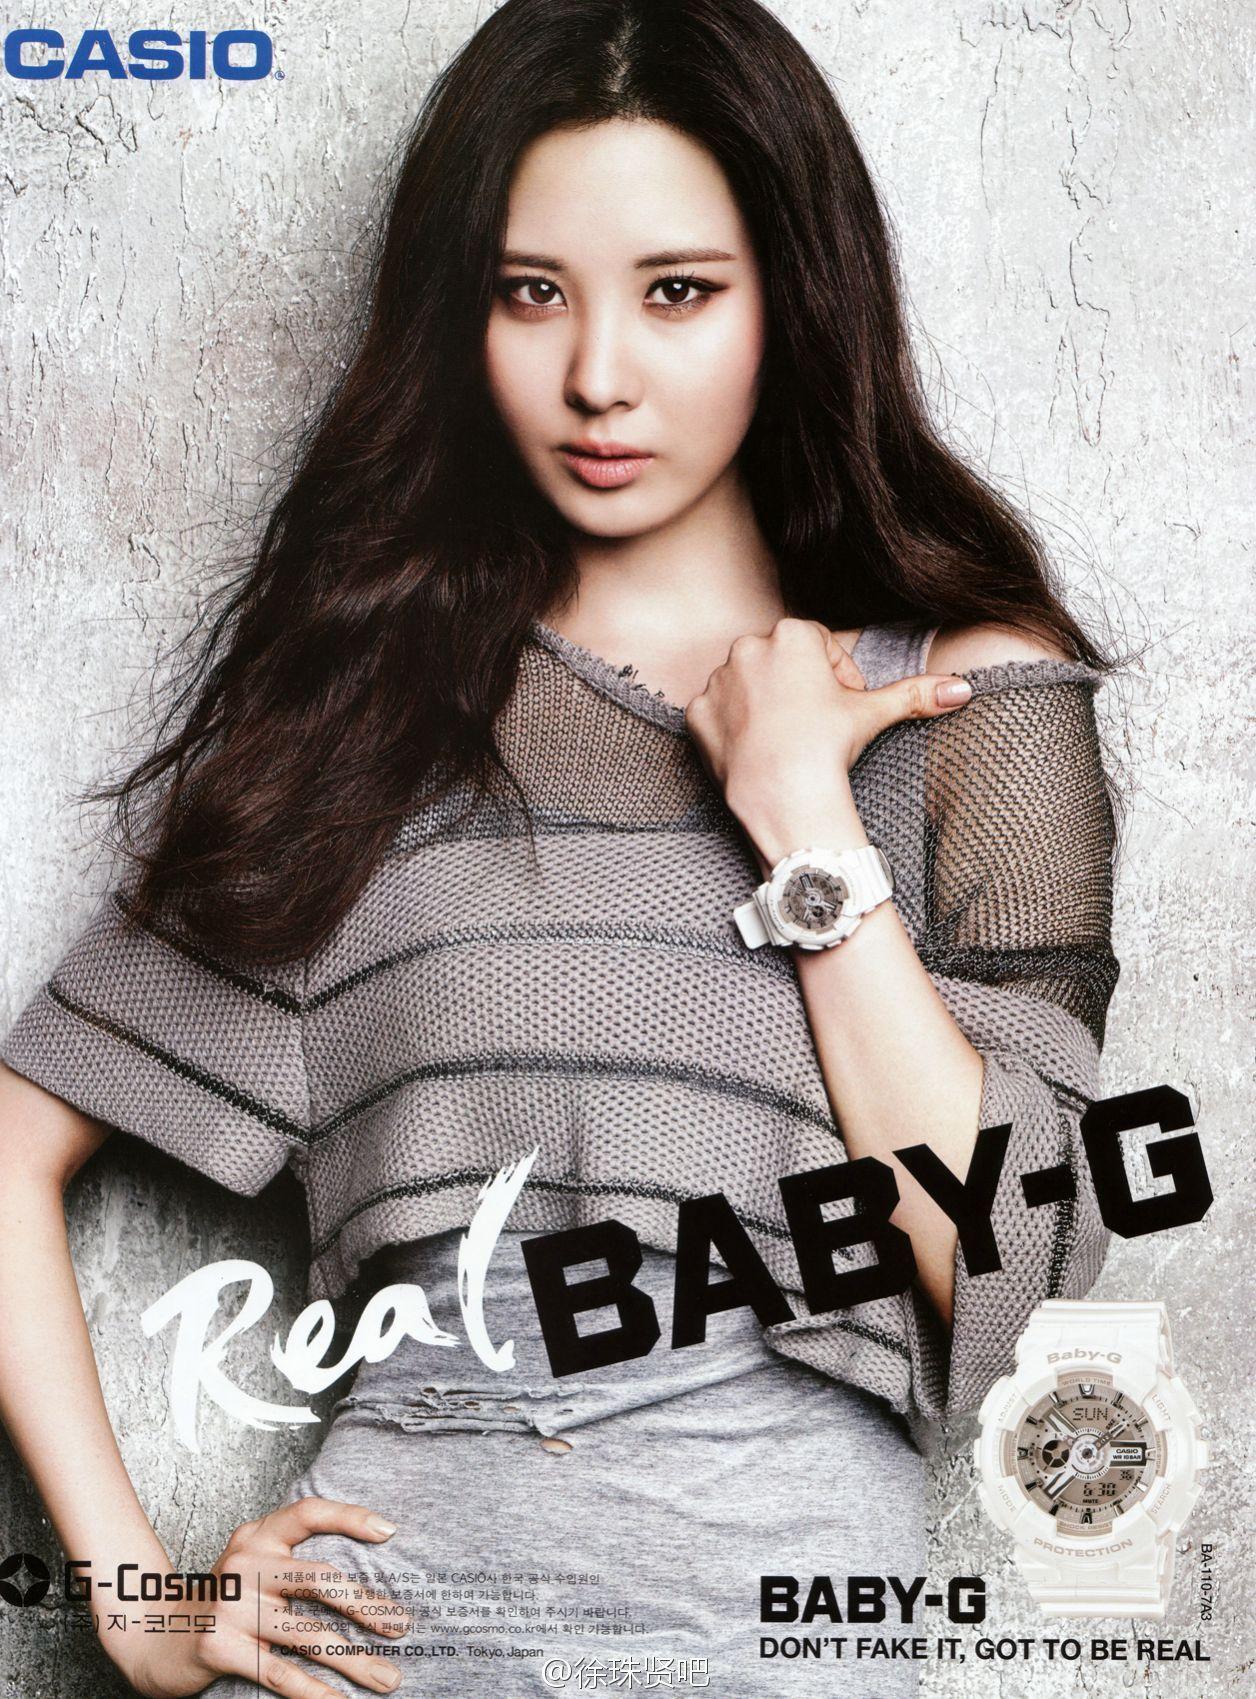 snsd real baby-G seohyun